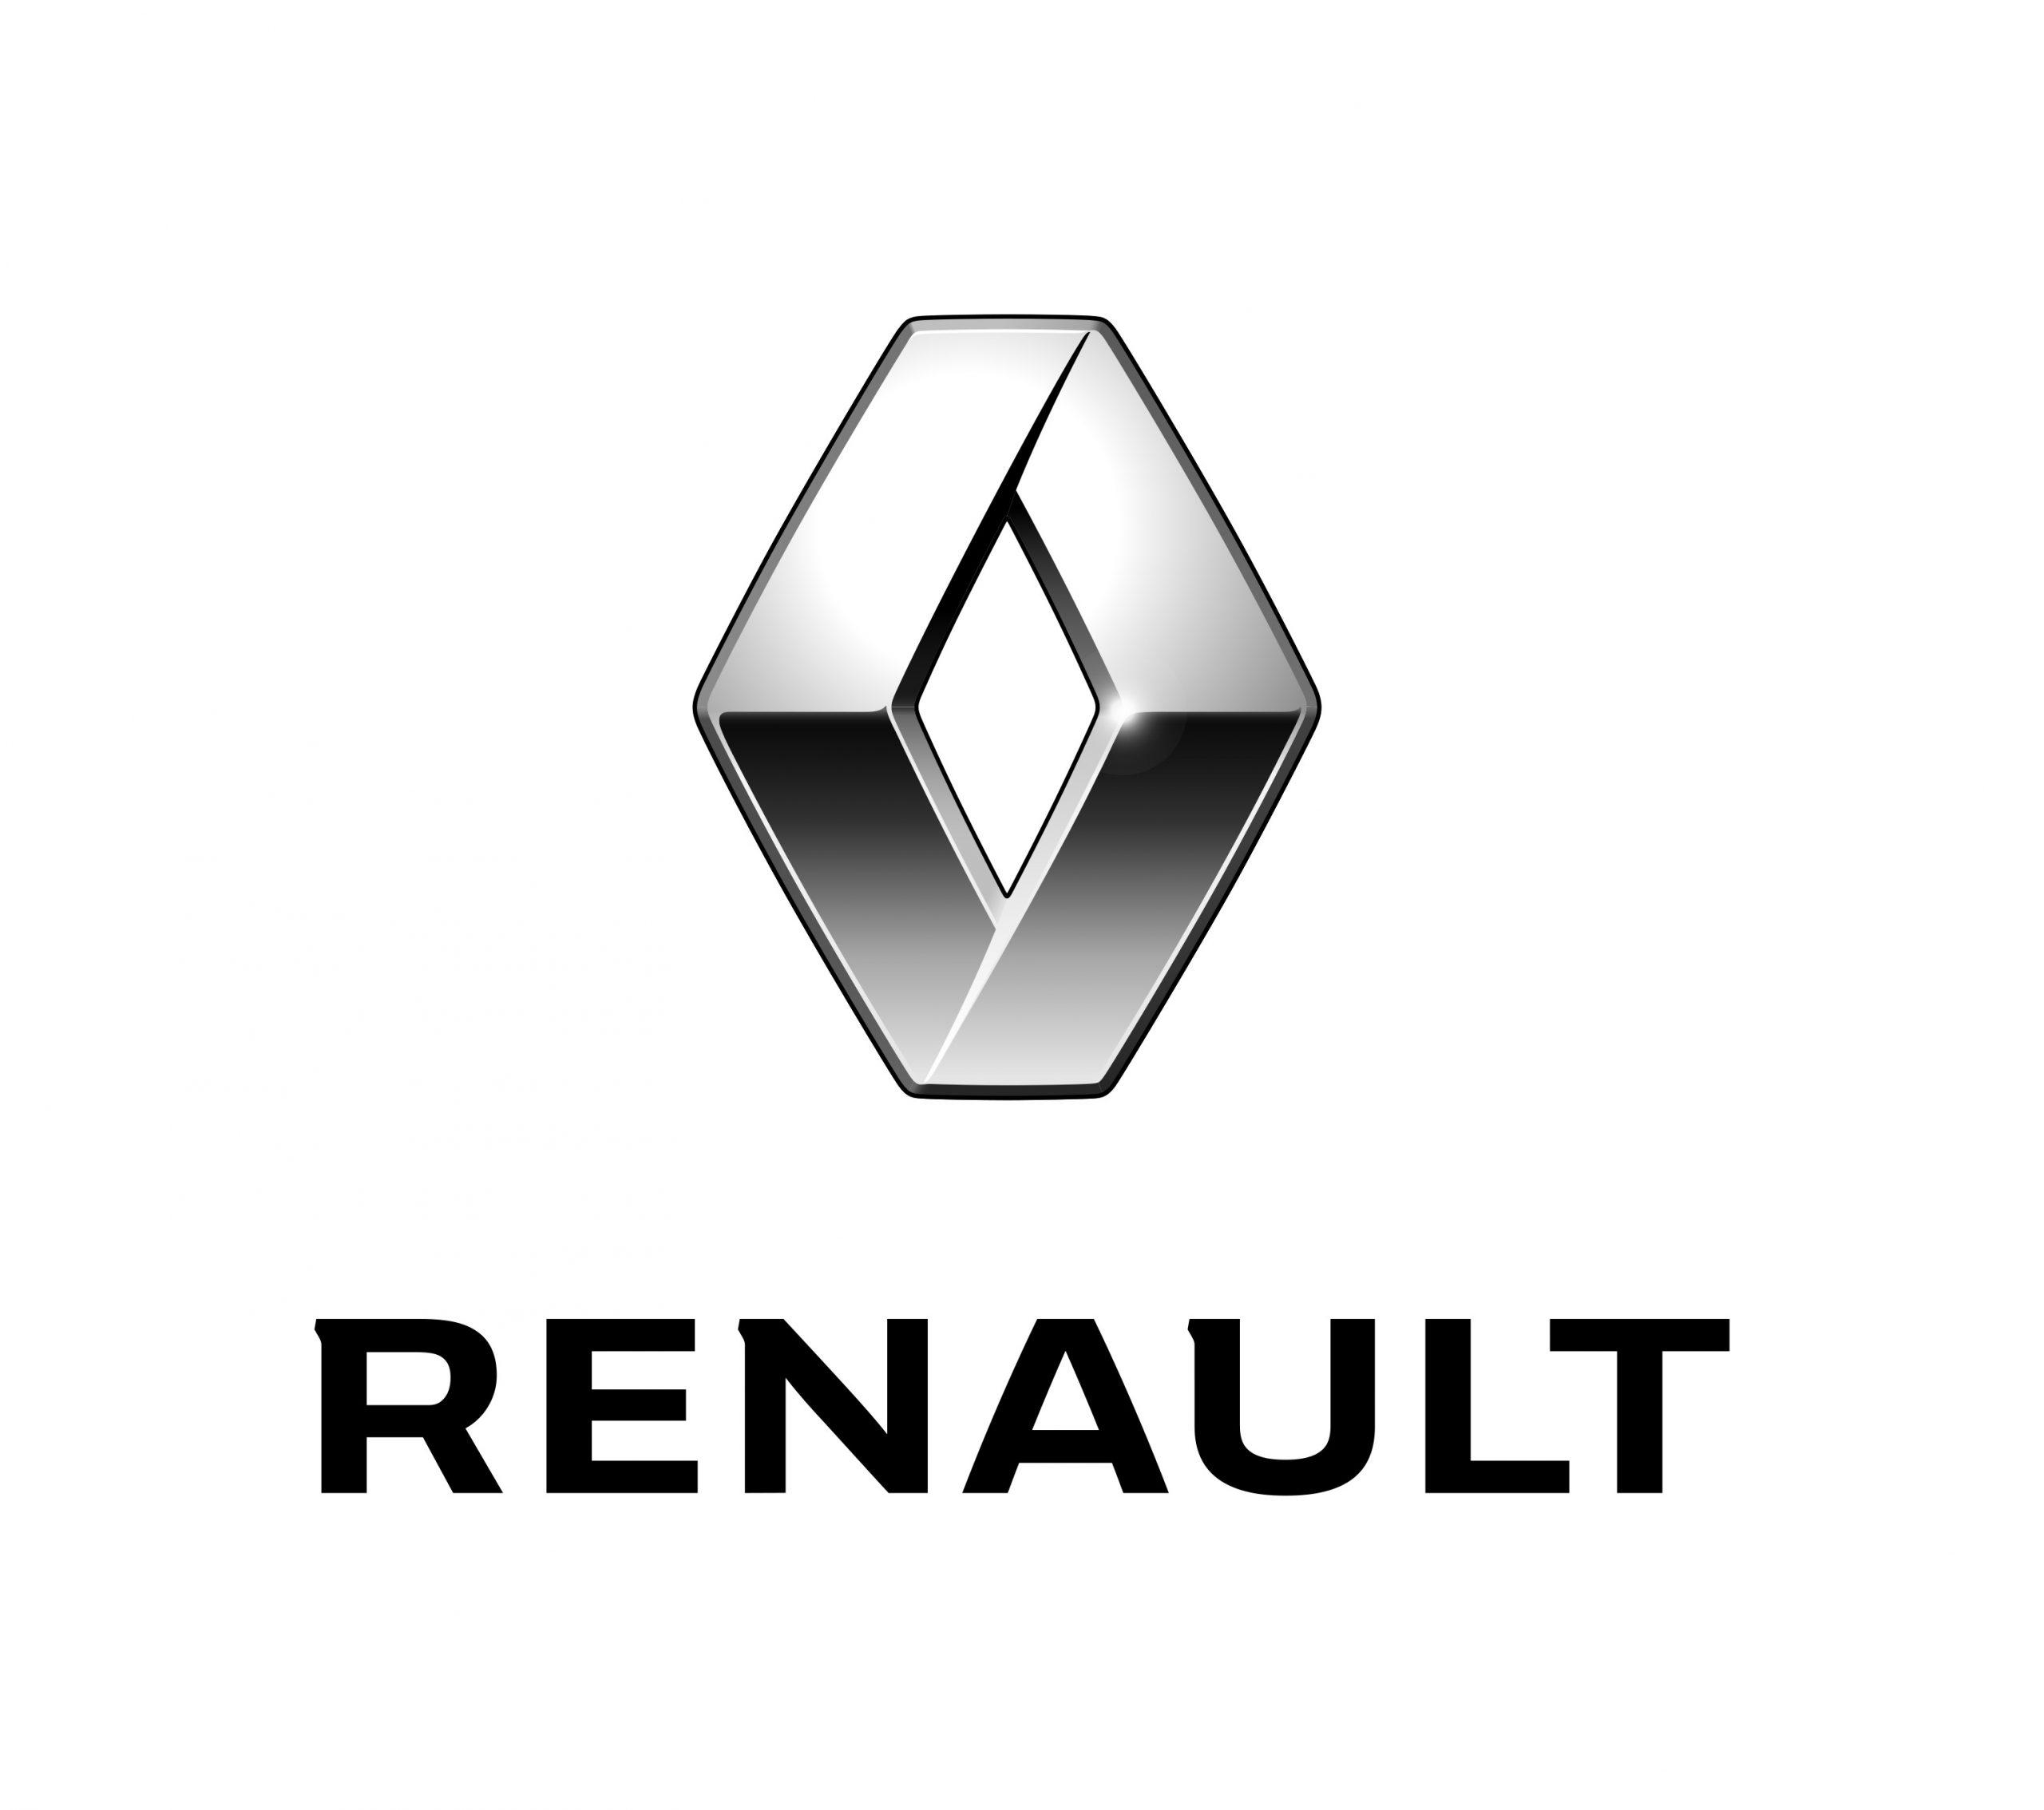 089-Renault